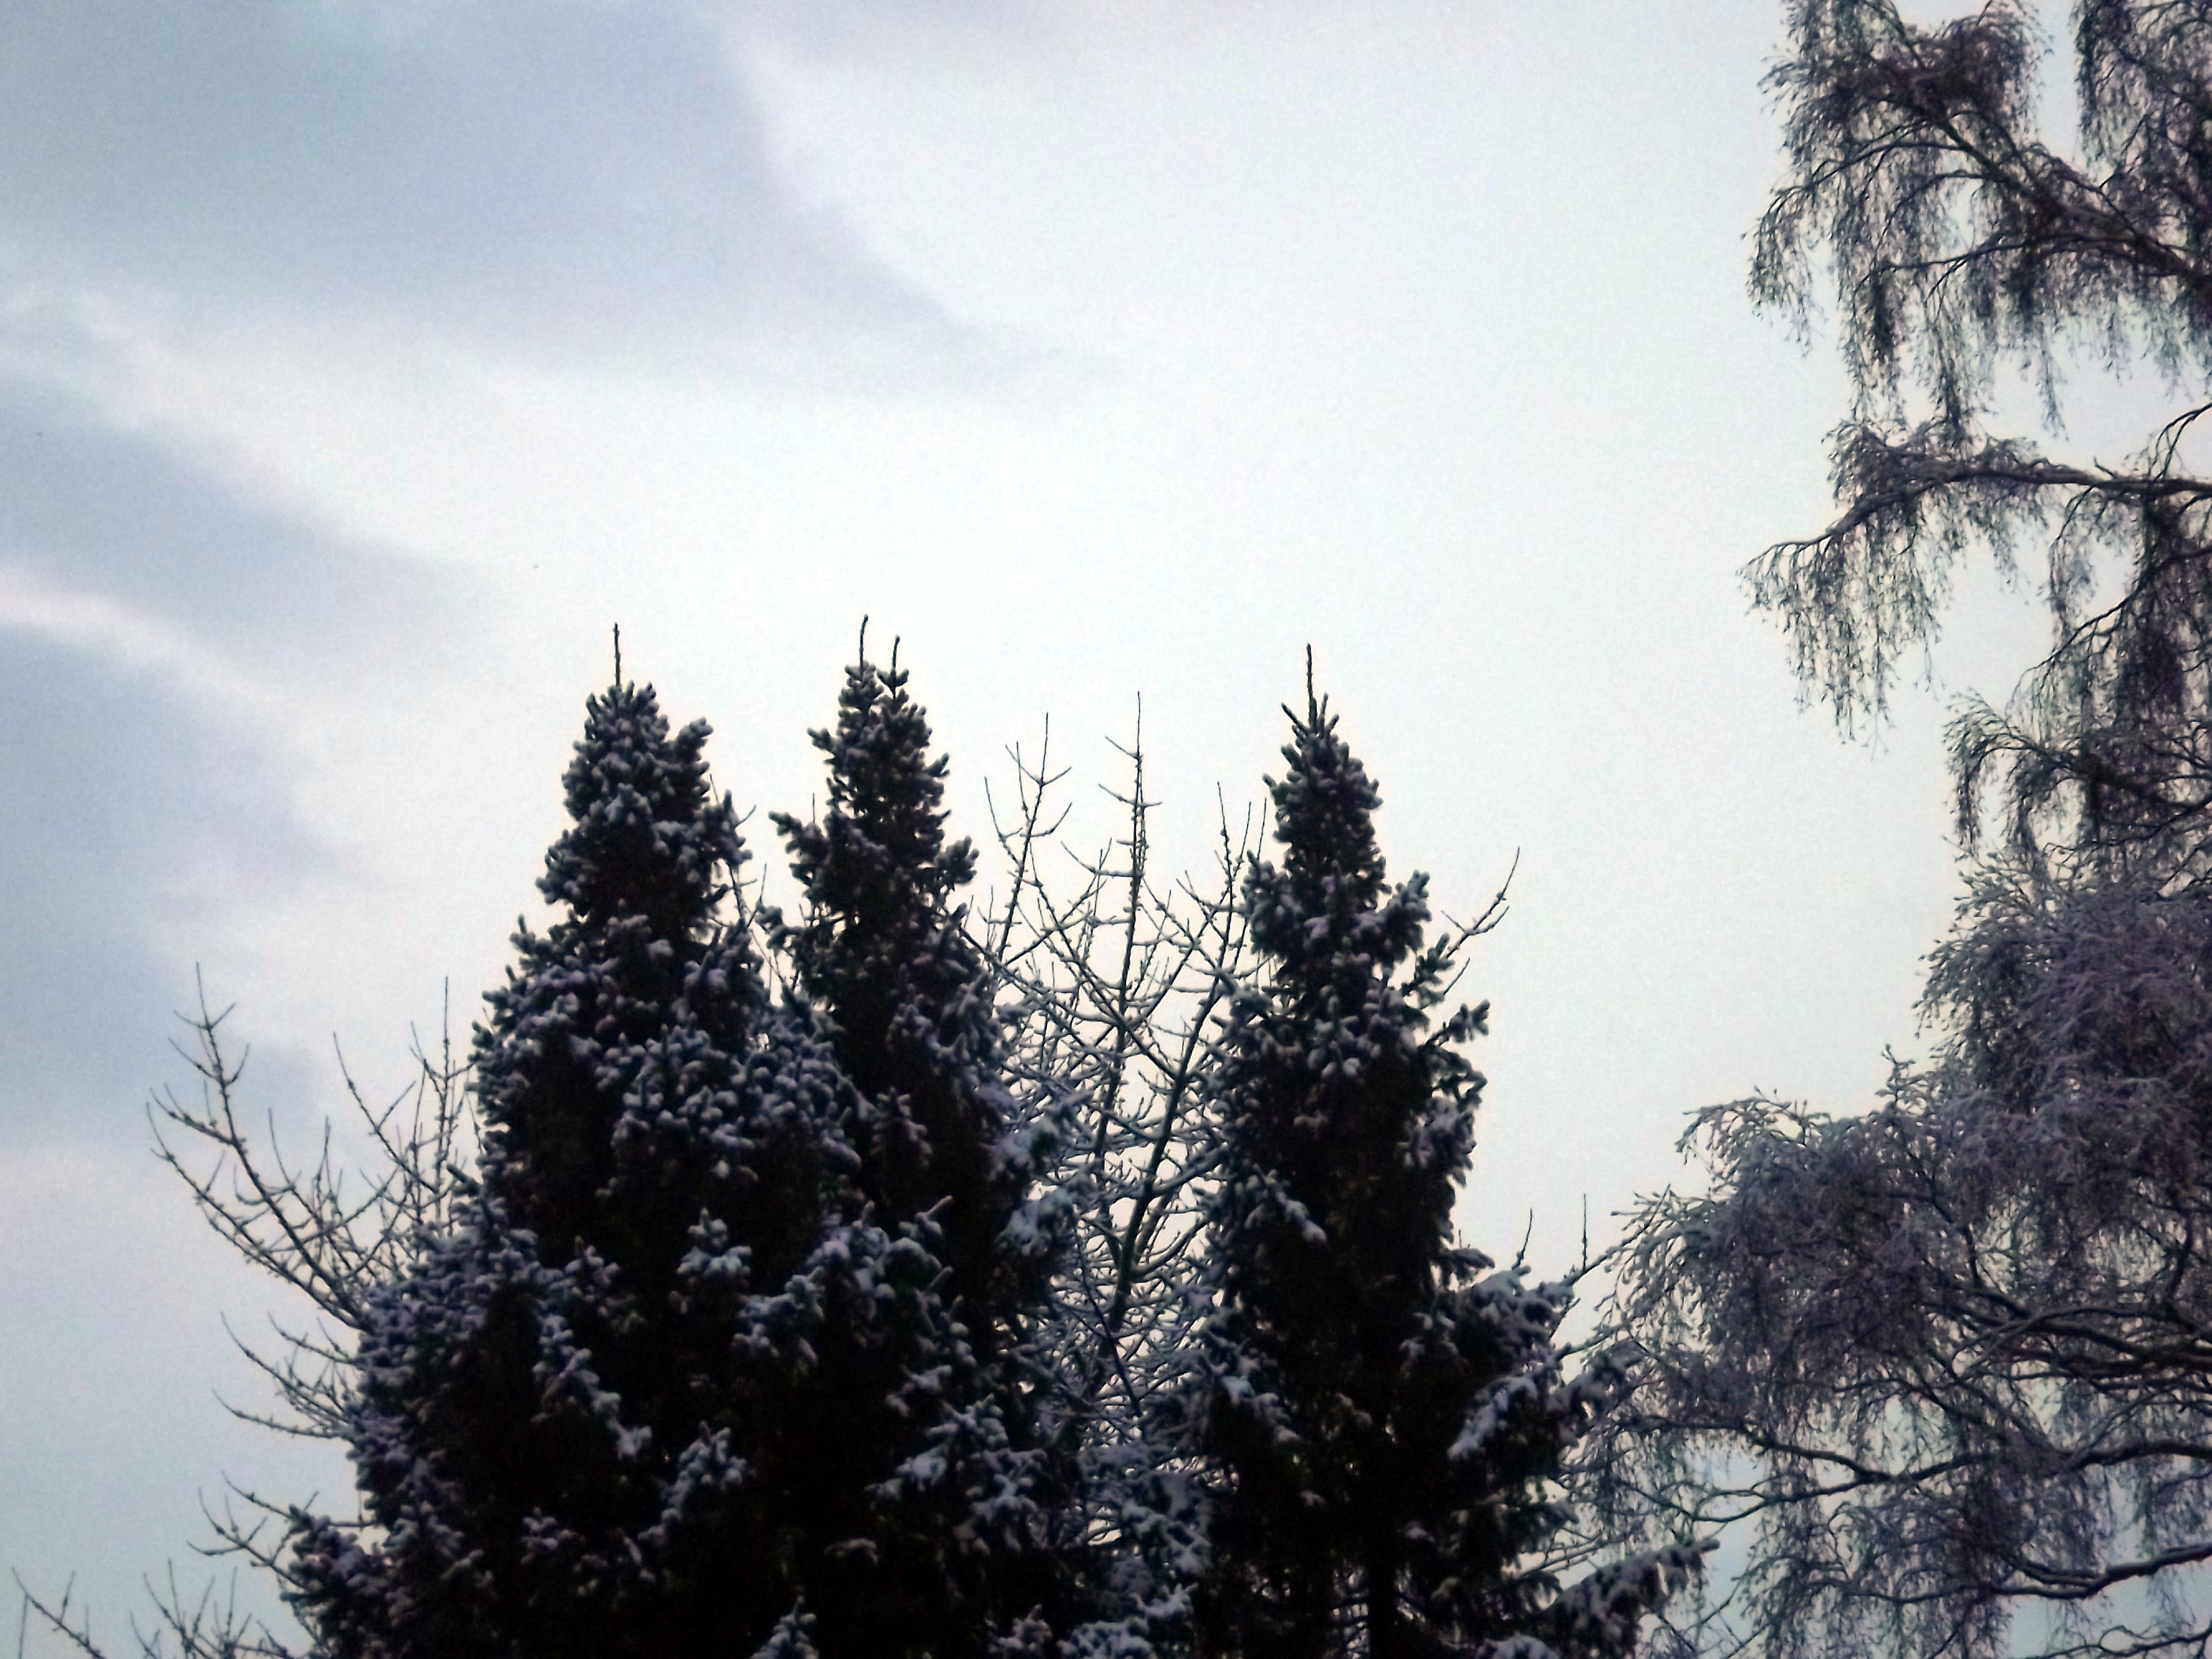 6875-tannen-verschneit-himmel